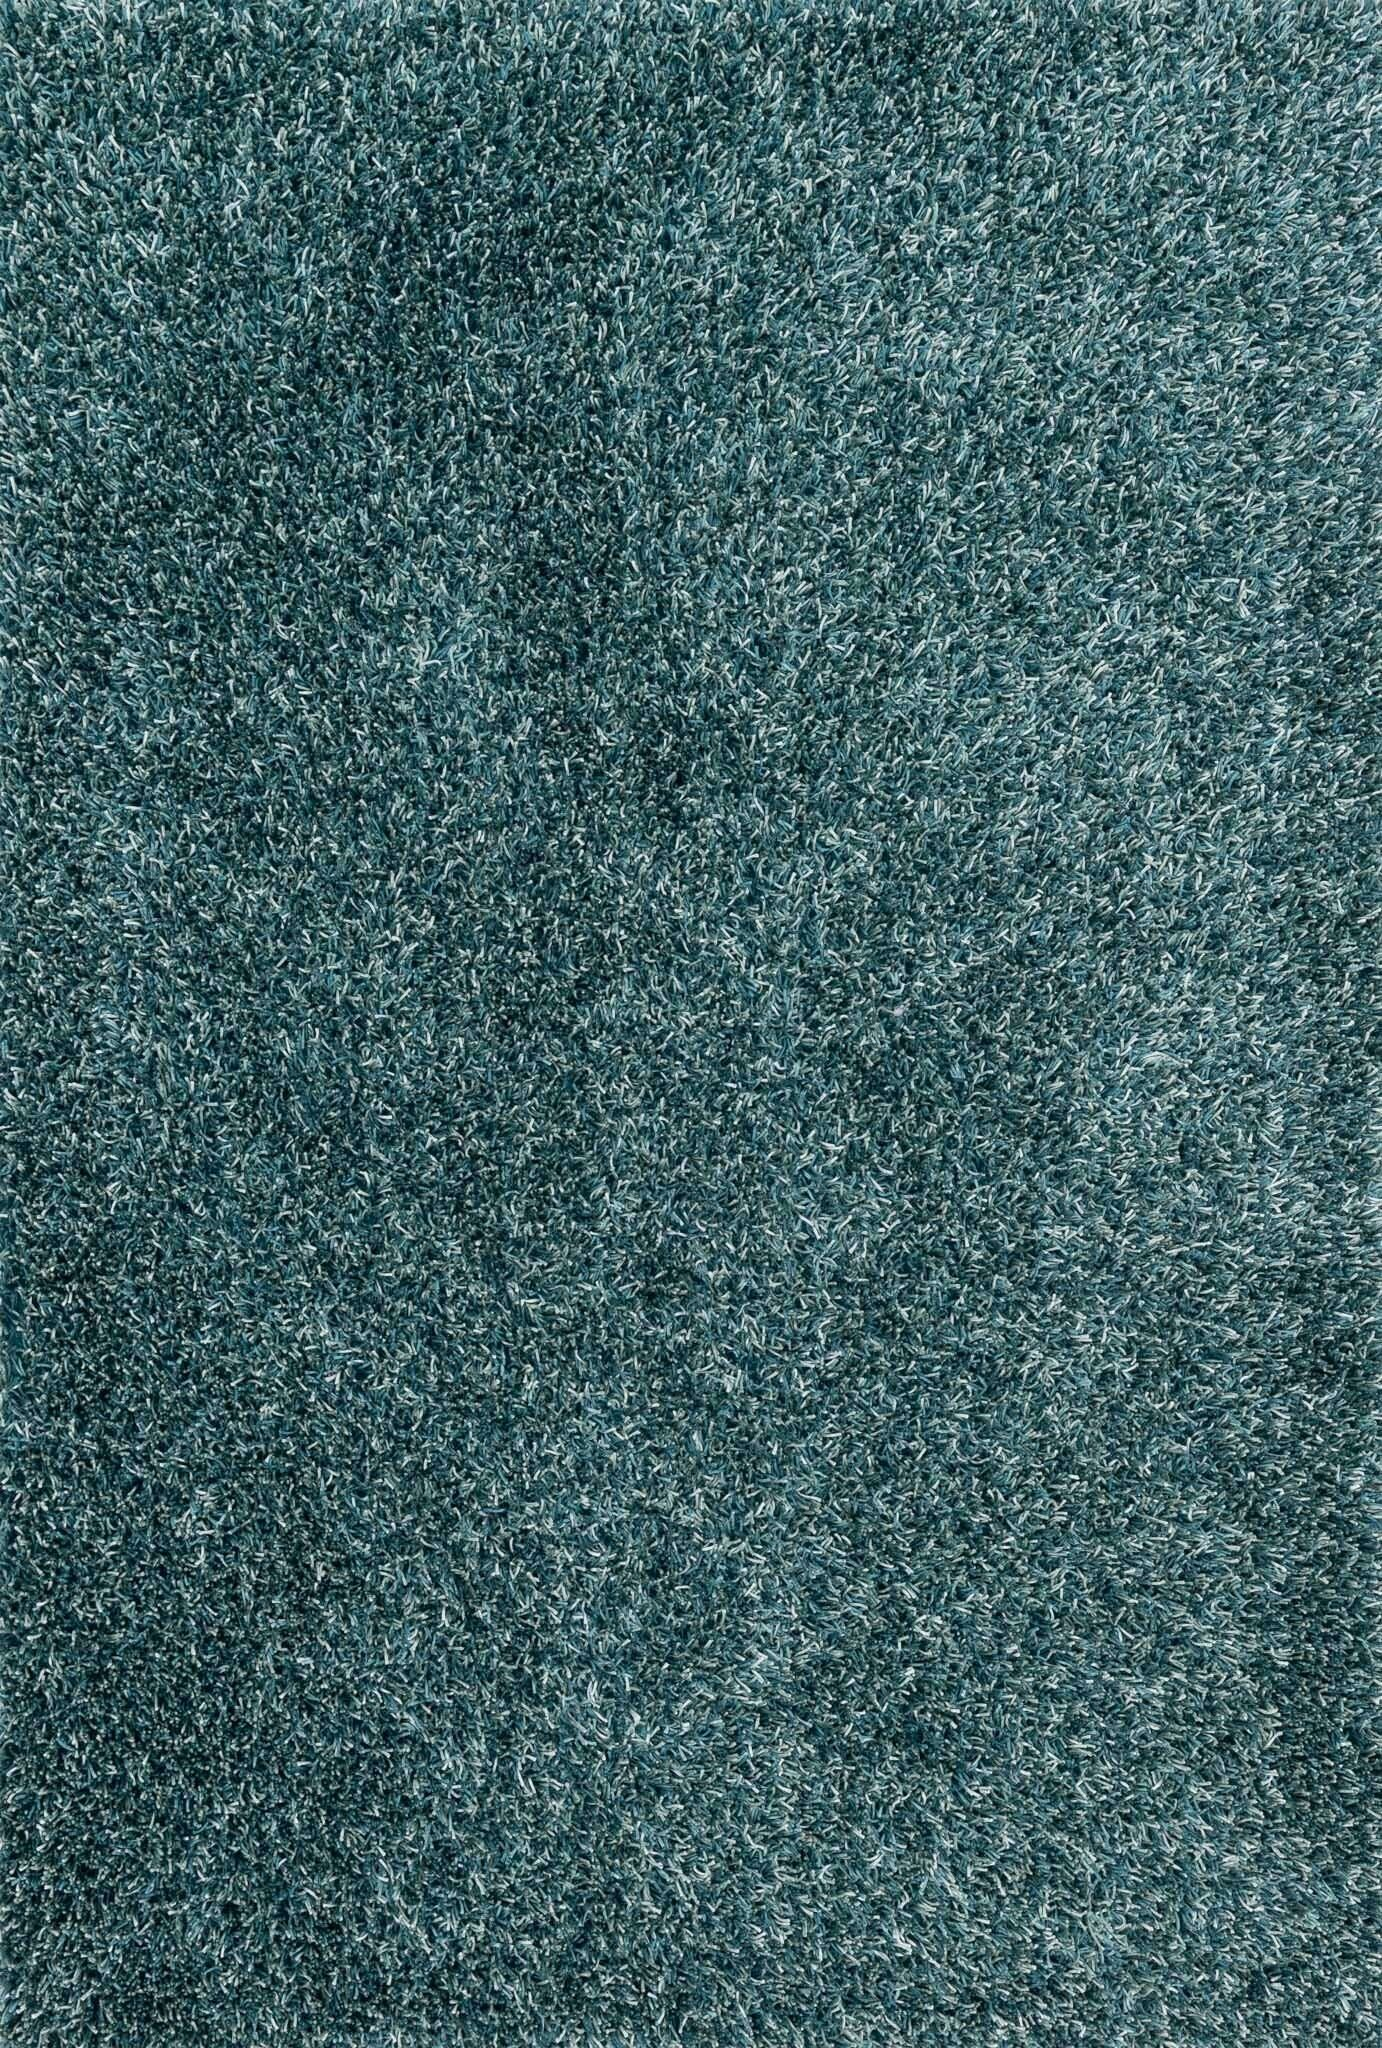 Ballif Hand-Tufted Seafoam Area Rug Rug Size: Rectangle 3'6